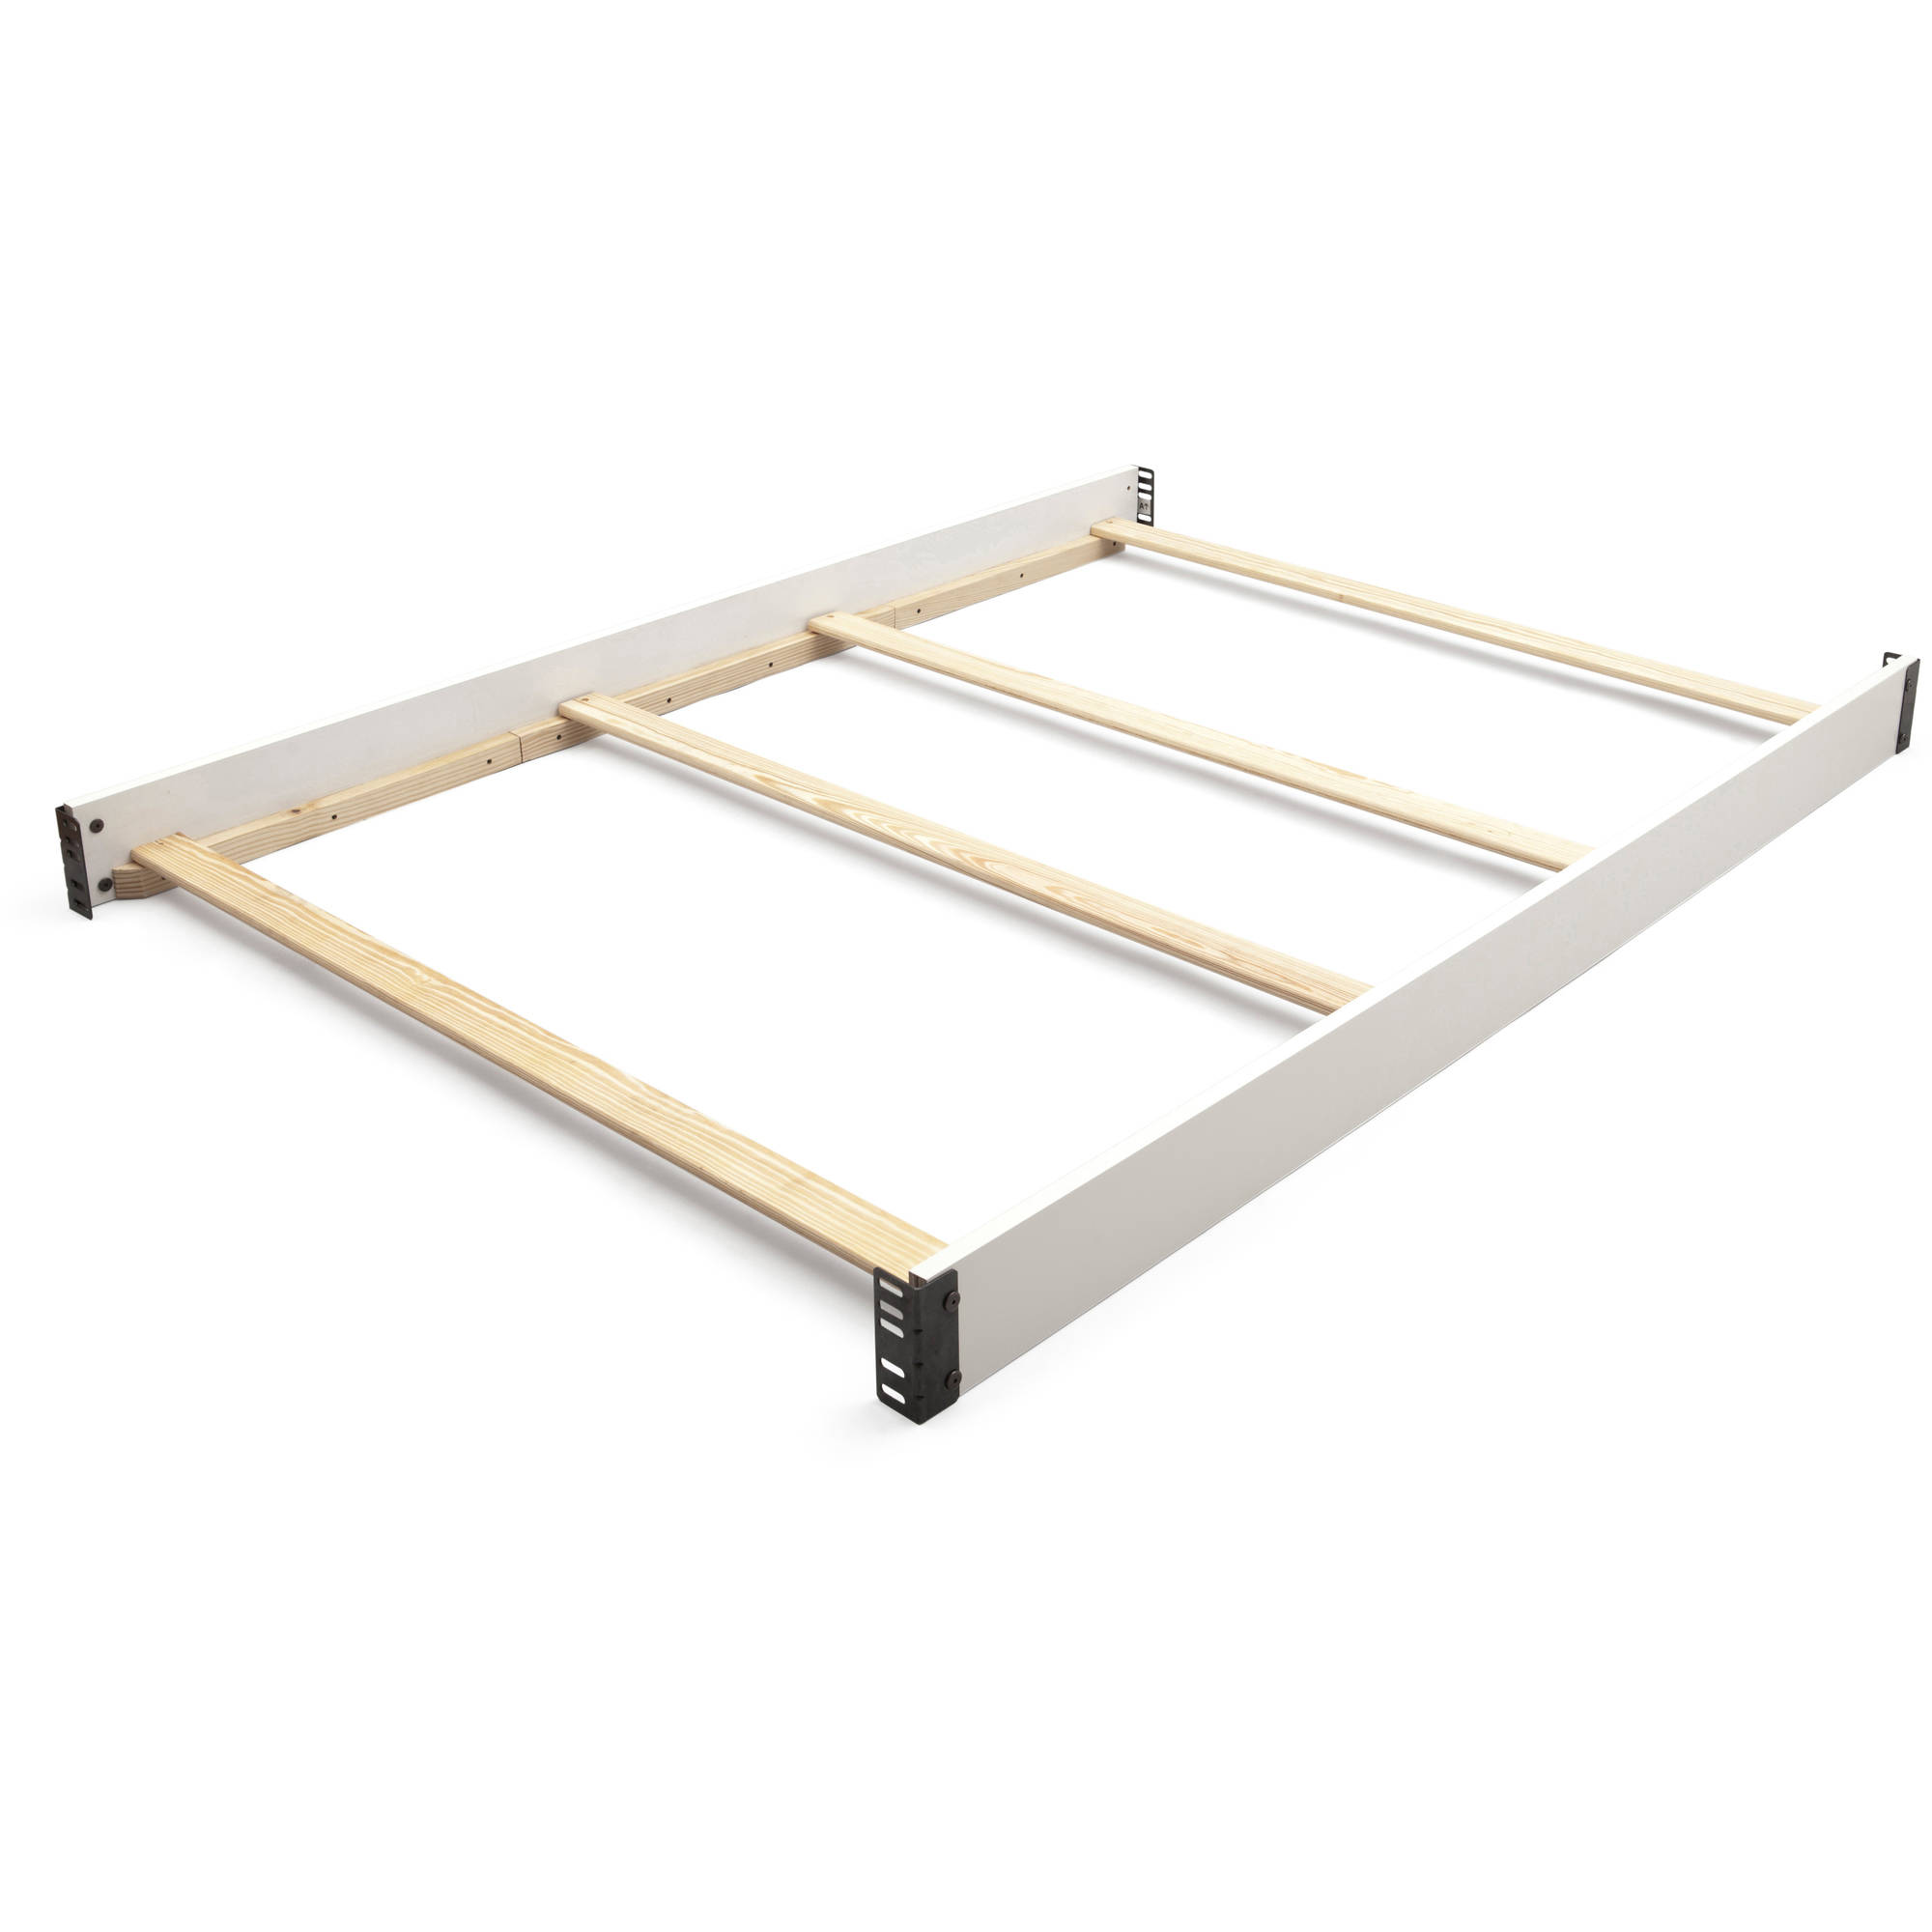 Delta Children Wooden Full-Size Bed Rails 0050, Choose Your Finish